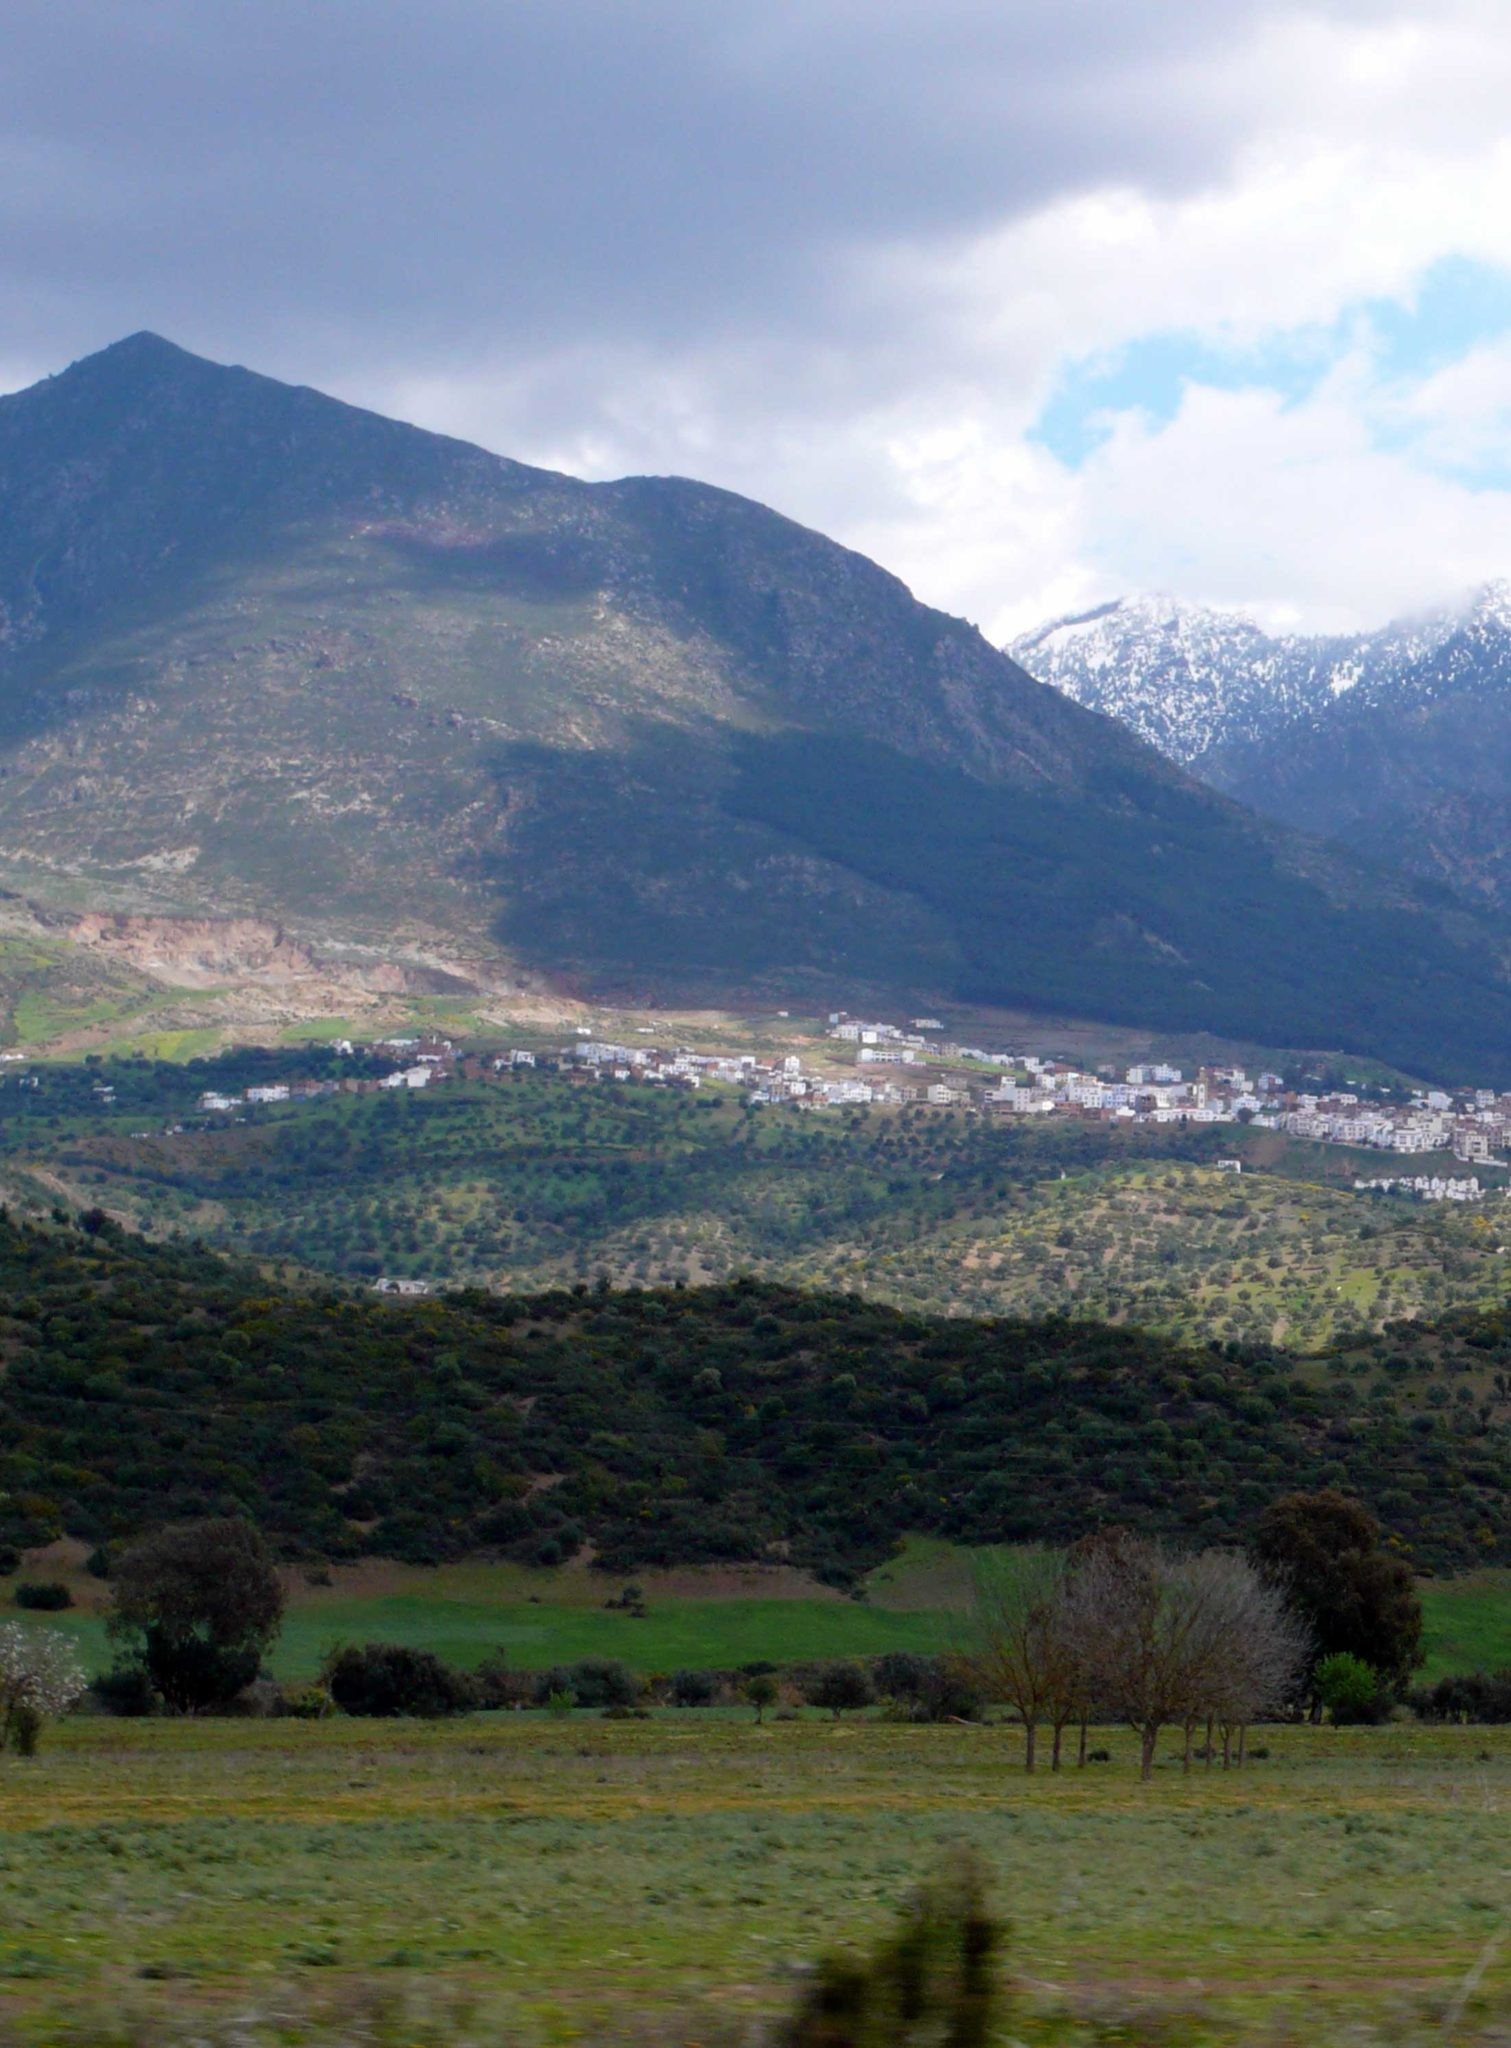 Moroccan Rif